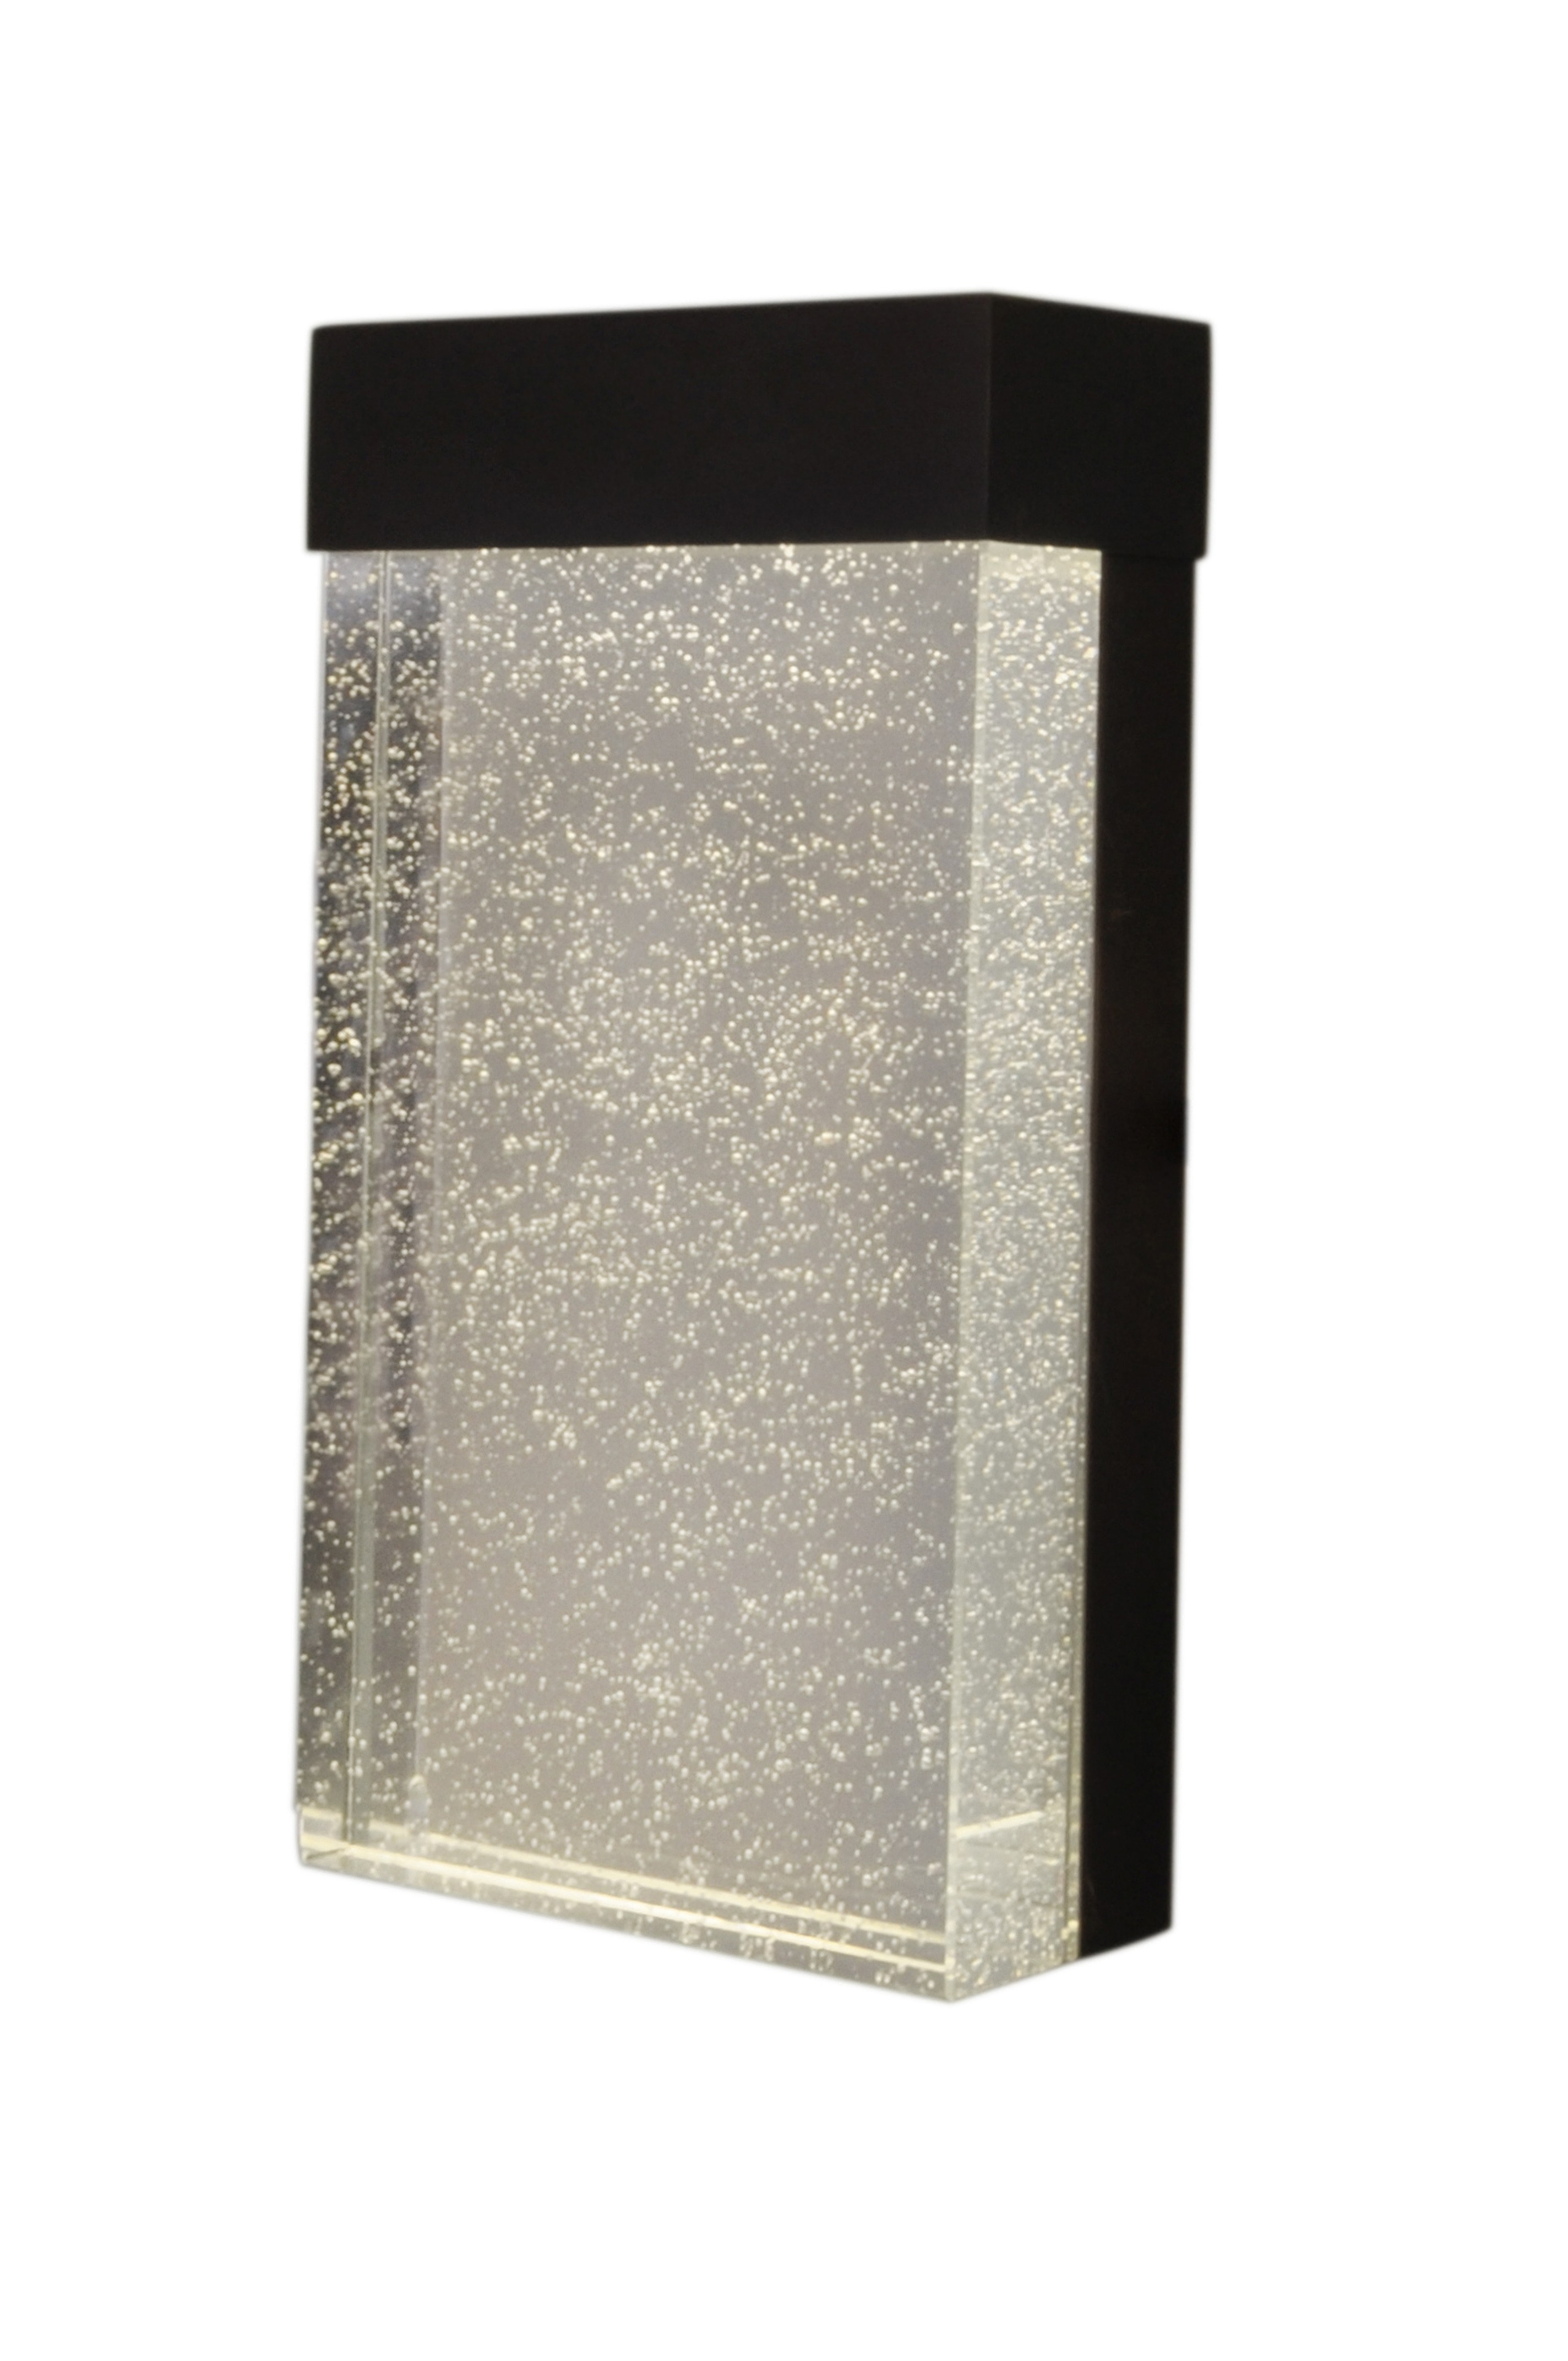 Moda LED Outdoor Wall Sconce | Maxim Lighting